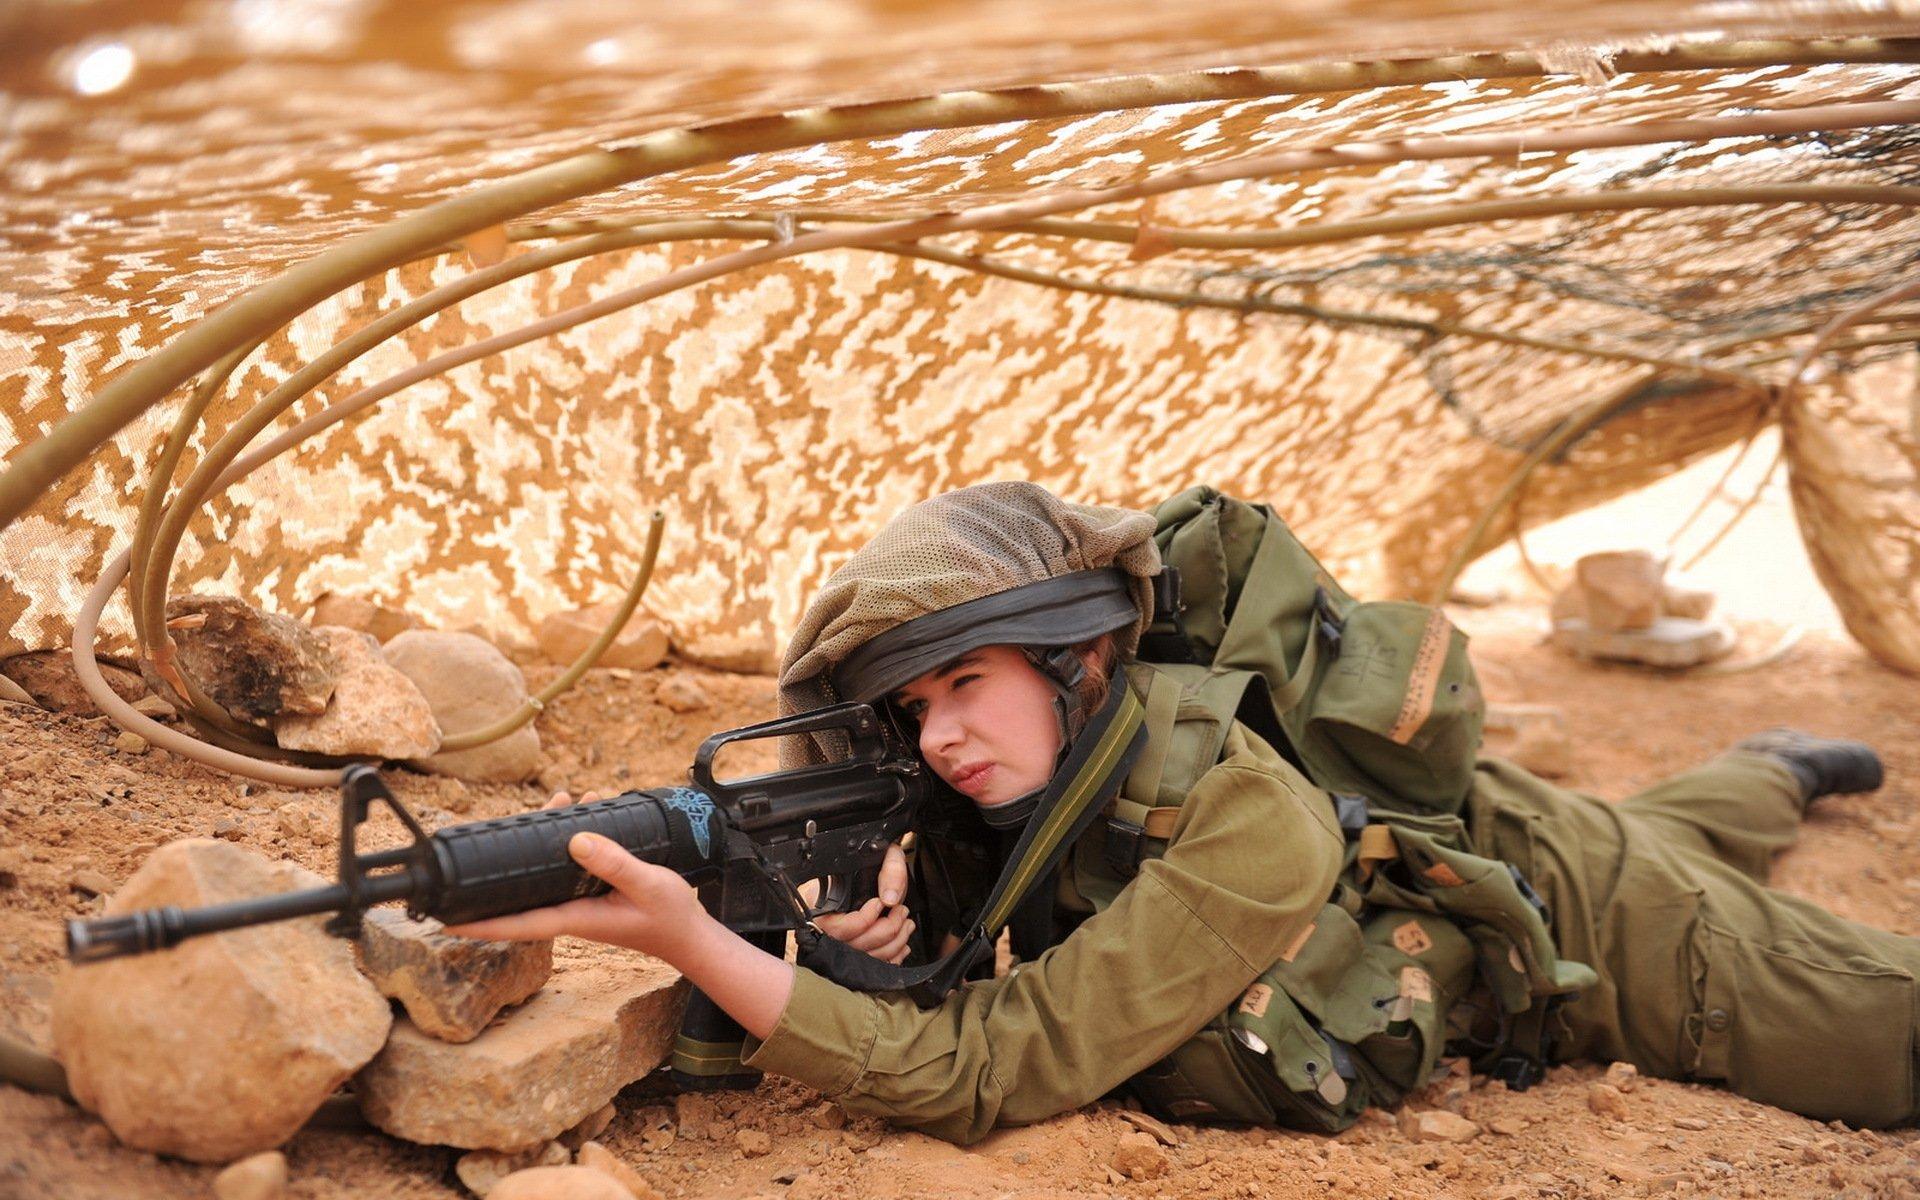 красивые картинки военные армия нехарактерен, при тяжелой